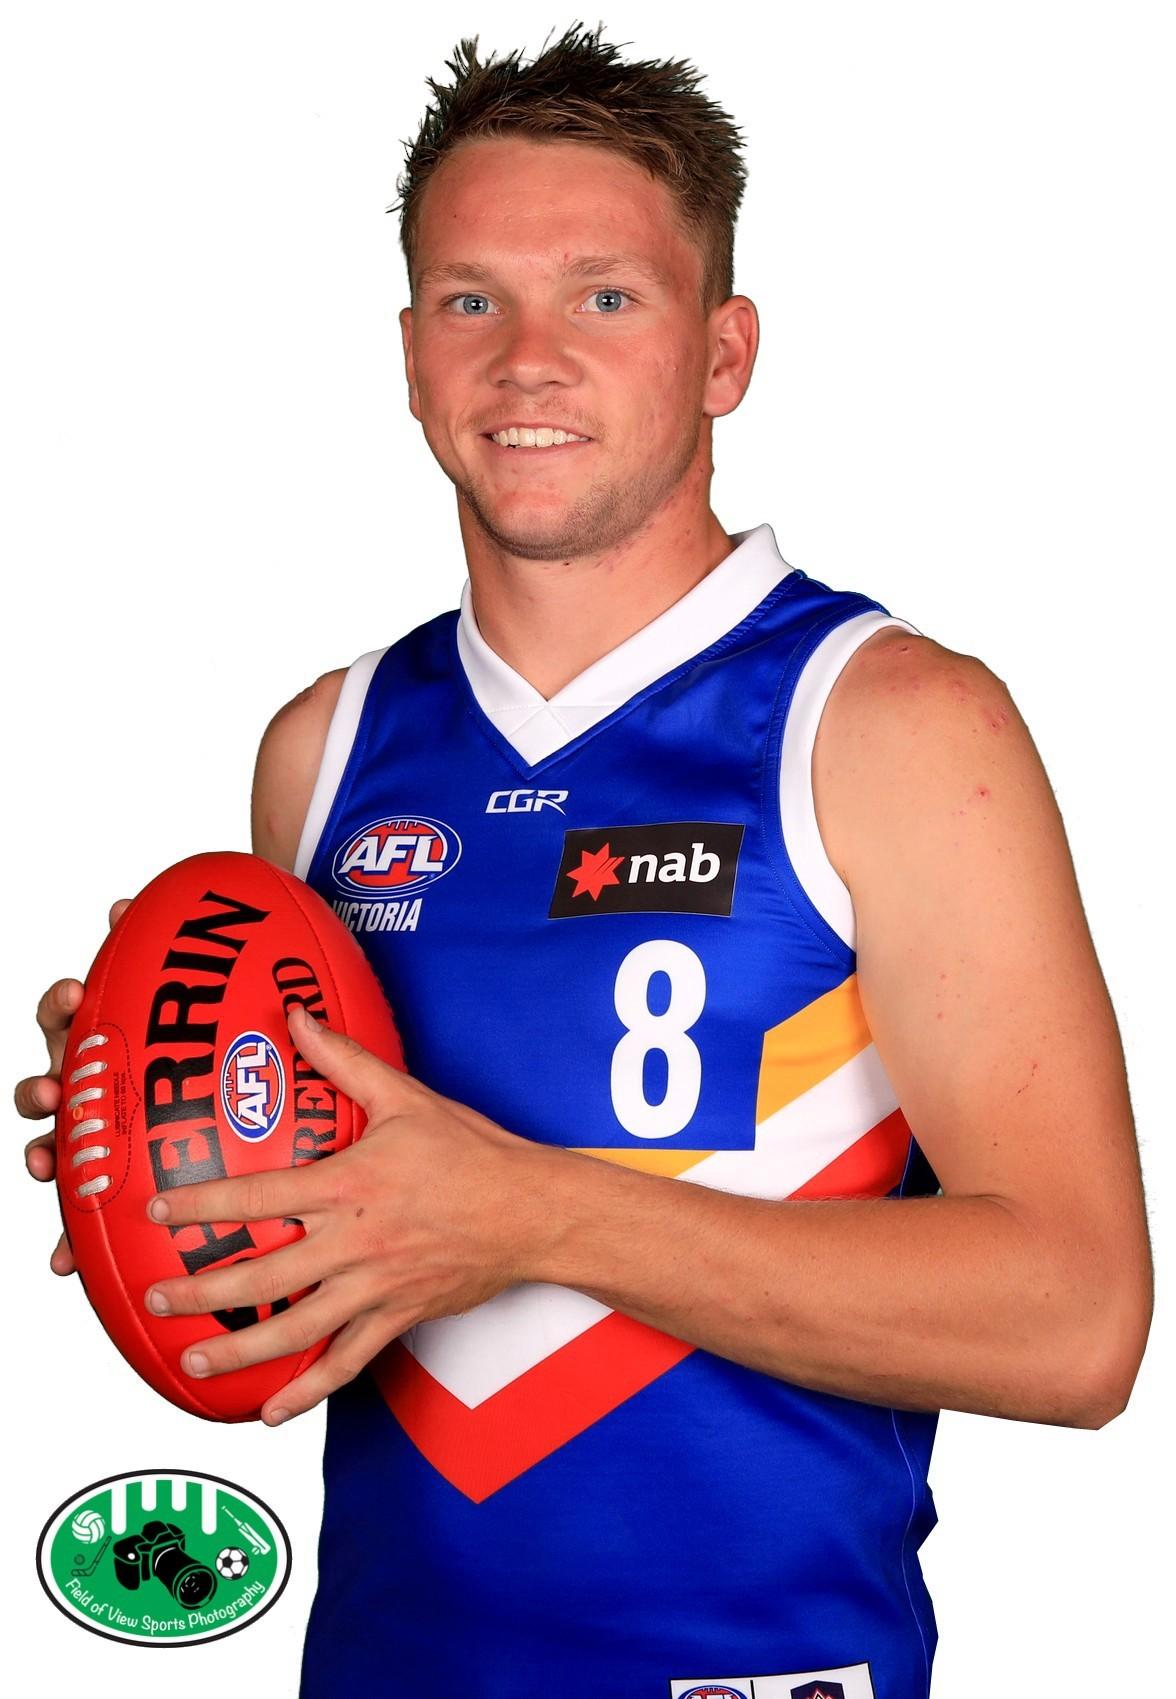 Rory Bailey